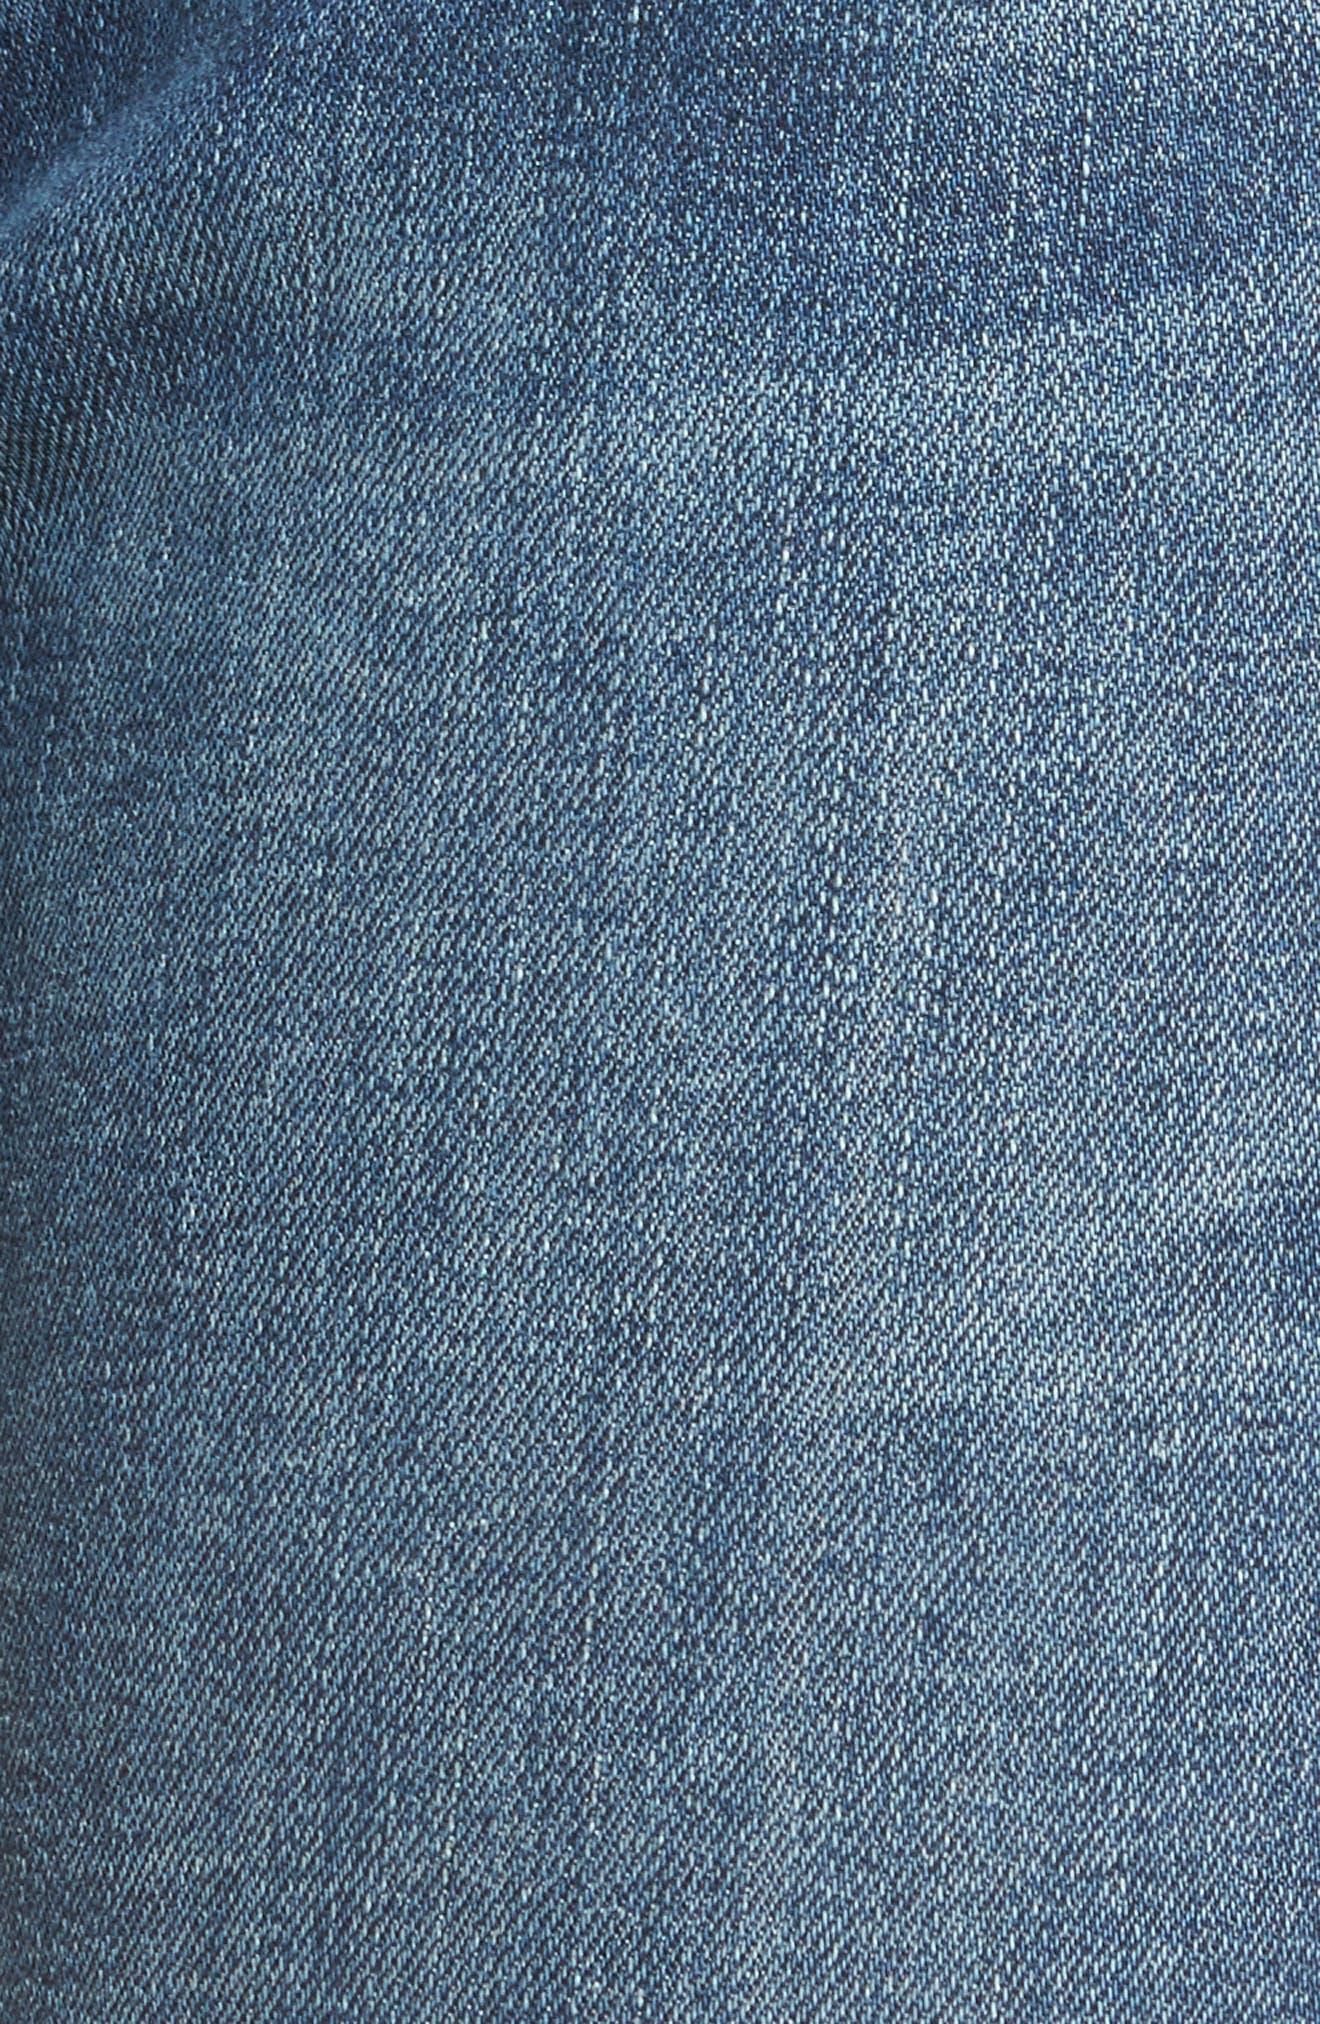 Alternate Image 6  - rag & bone/JEAN The Dre Released Hem Slim Boyfriend Jeans (Amelie)